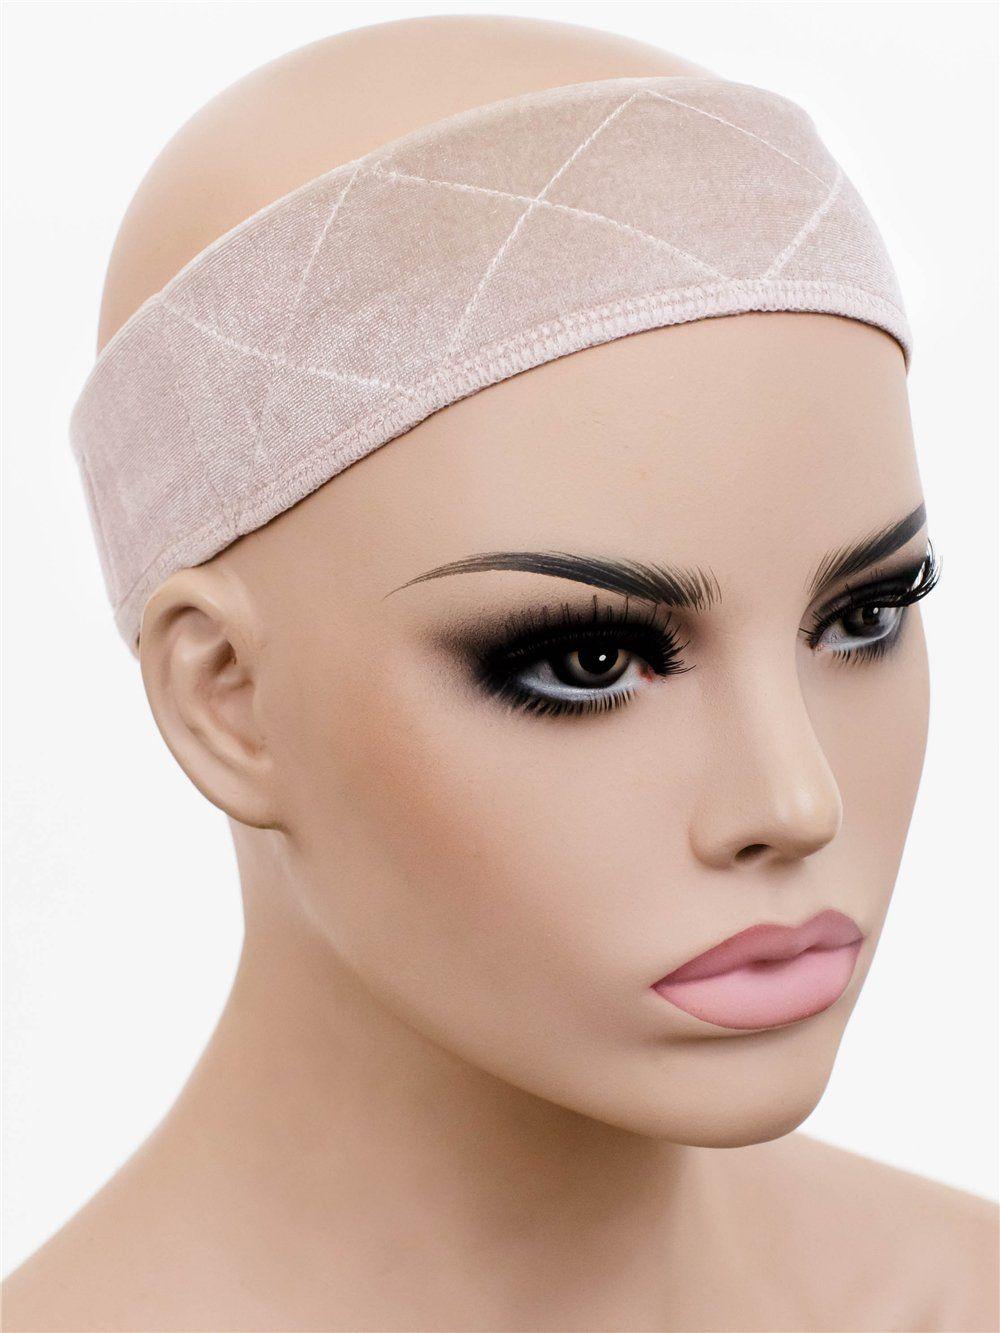 Park Art|My WordPress Blog_Dola Hair Reviews Headband Wig